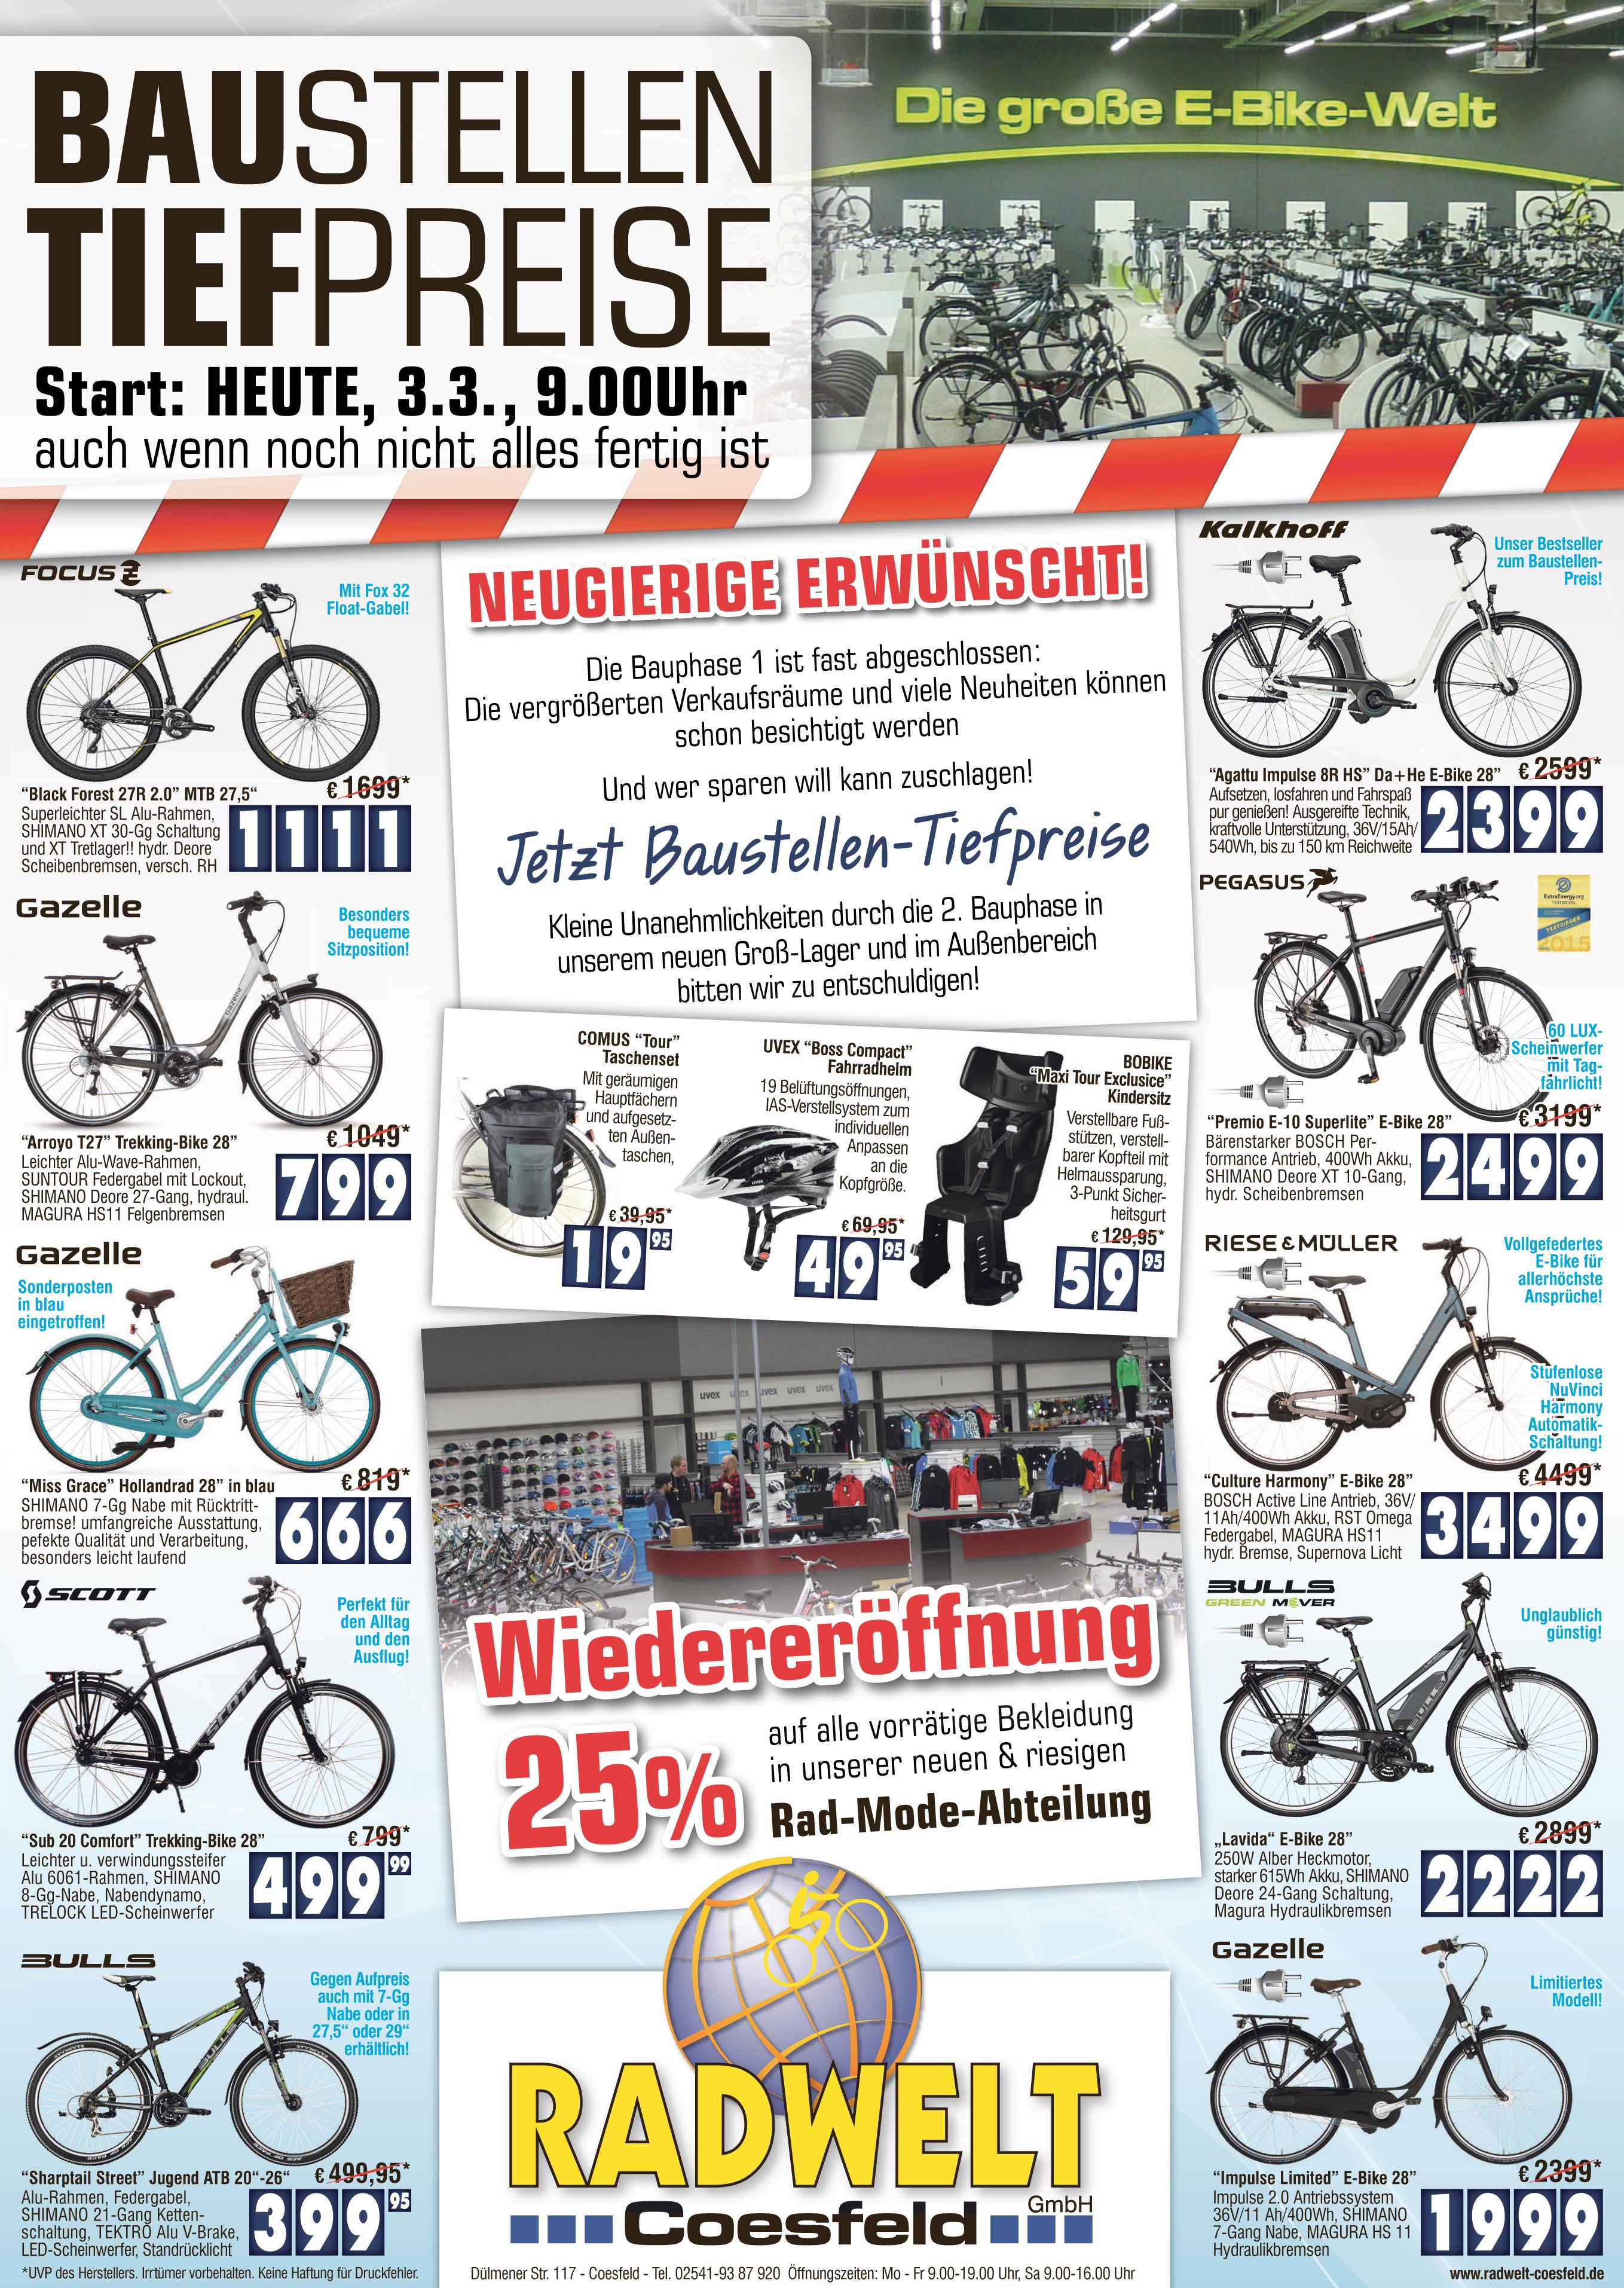 14087_Coesfeld_Wiederer-ffnung_Heute_5x324